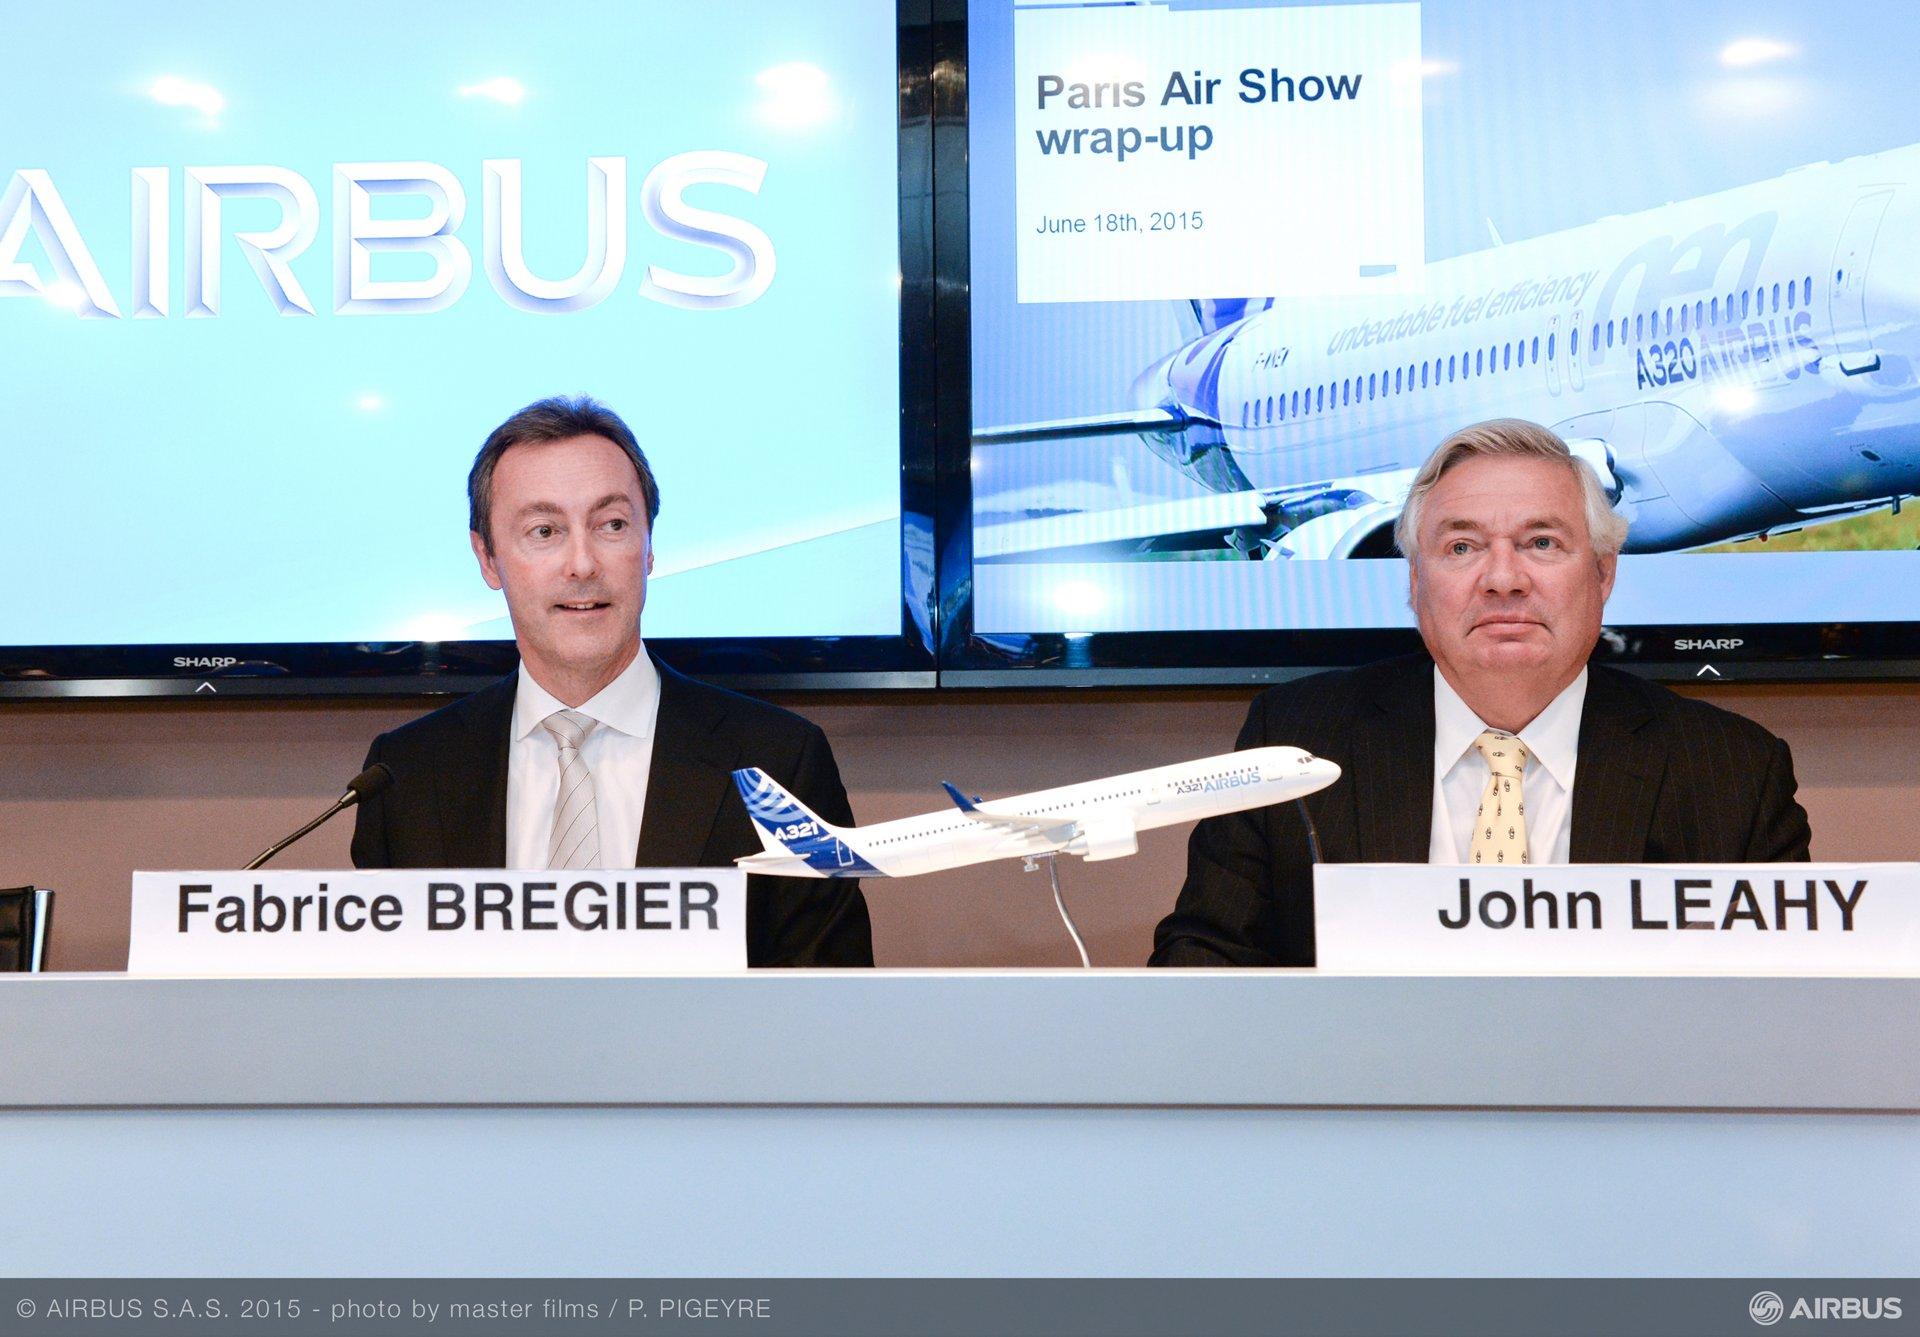 Paris Air Show 2015_End-of-show press conference 1